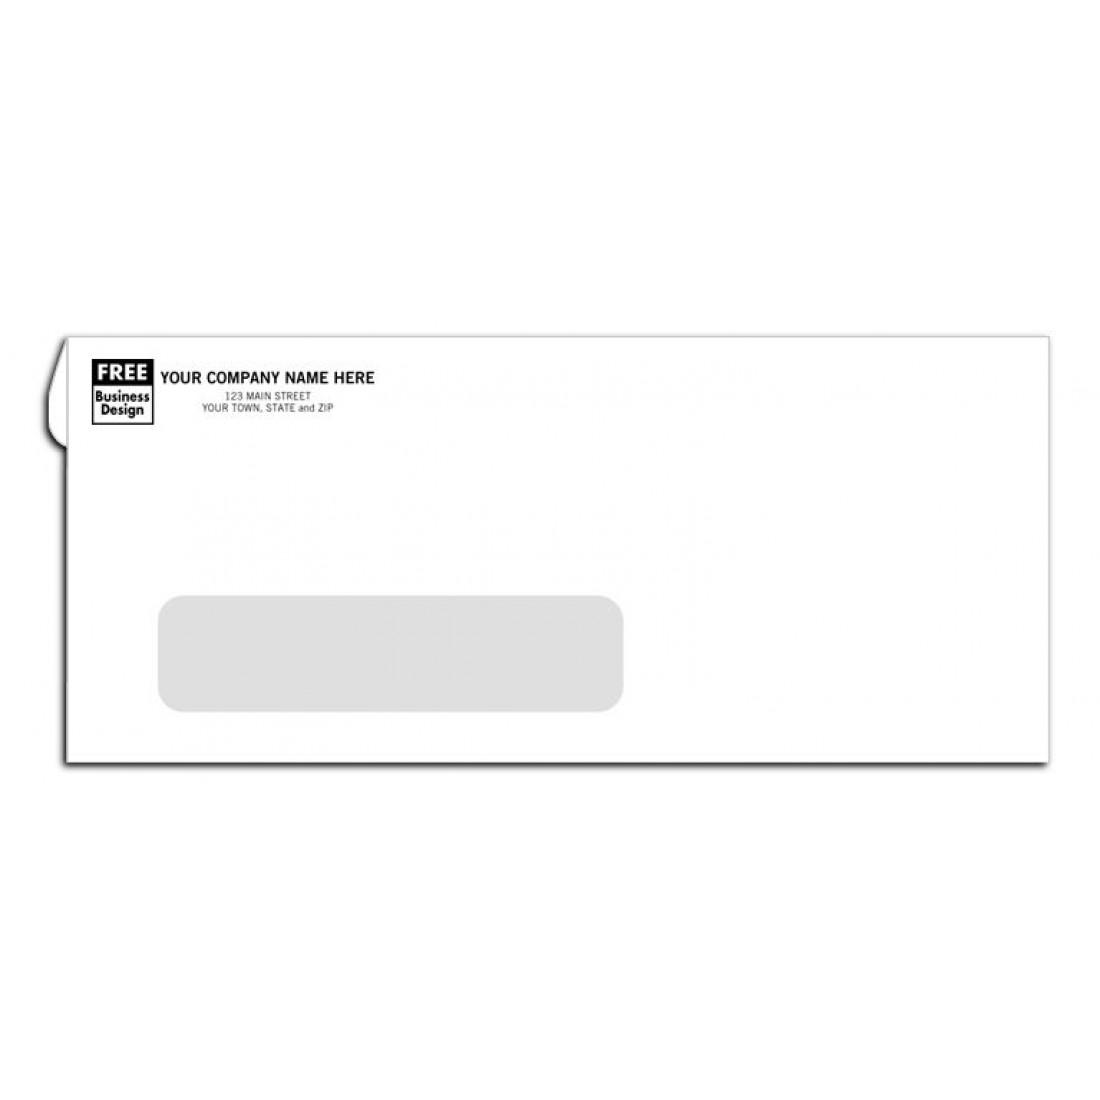 No. 10 Envelopes, Single Window, Self Seal